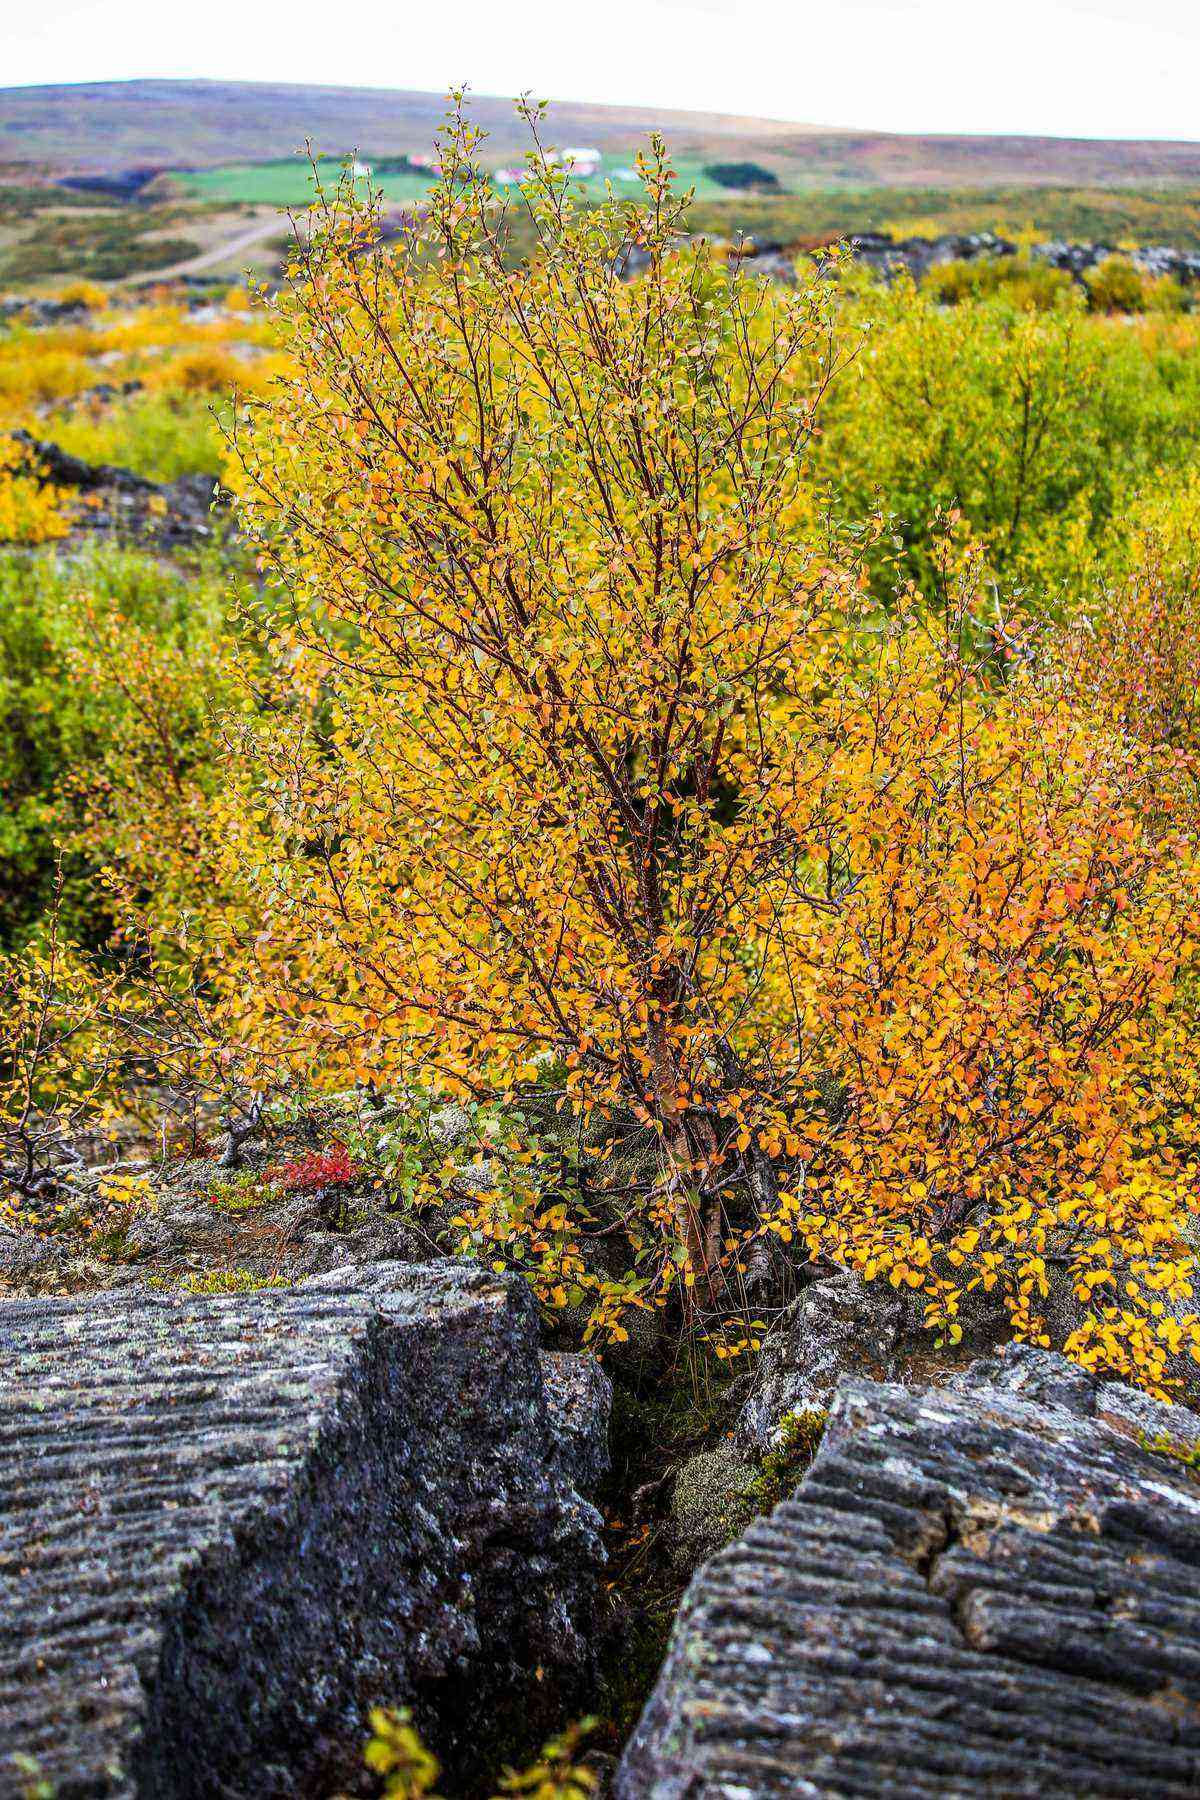 Miniature-birch-tree-in-autumn-growing-between-a-huge-split-volcanic-rock-in-Husafell-Reykholt-western-central-Iceland